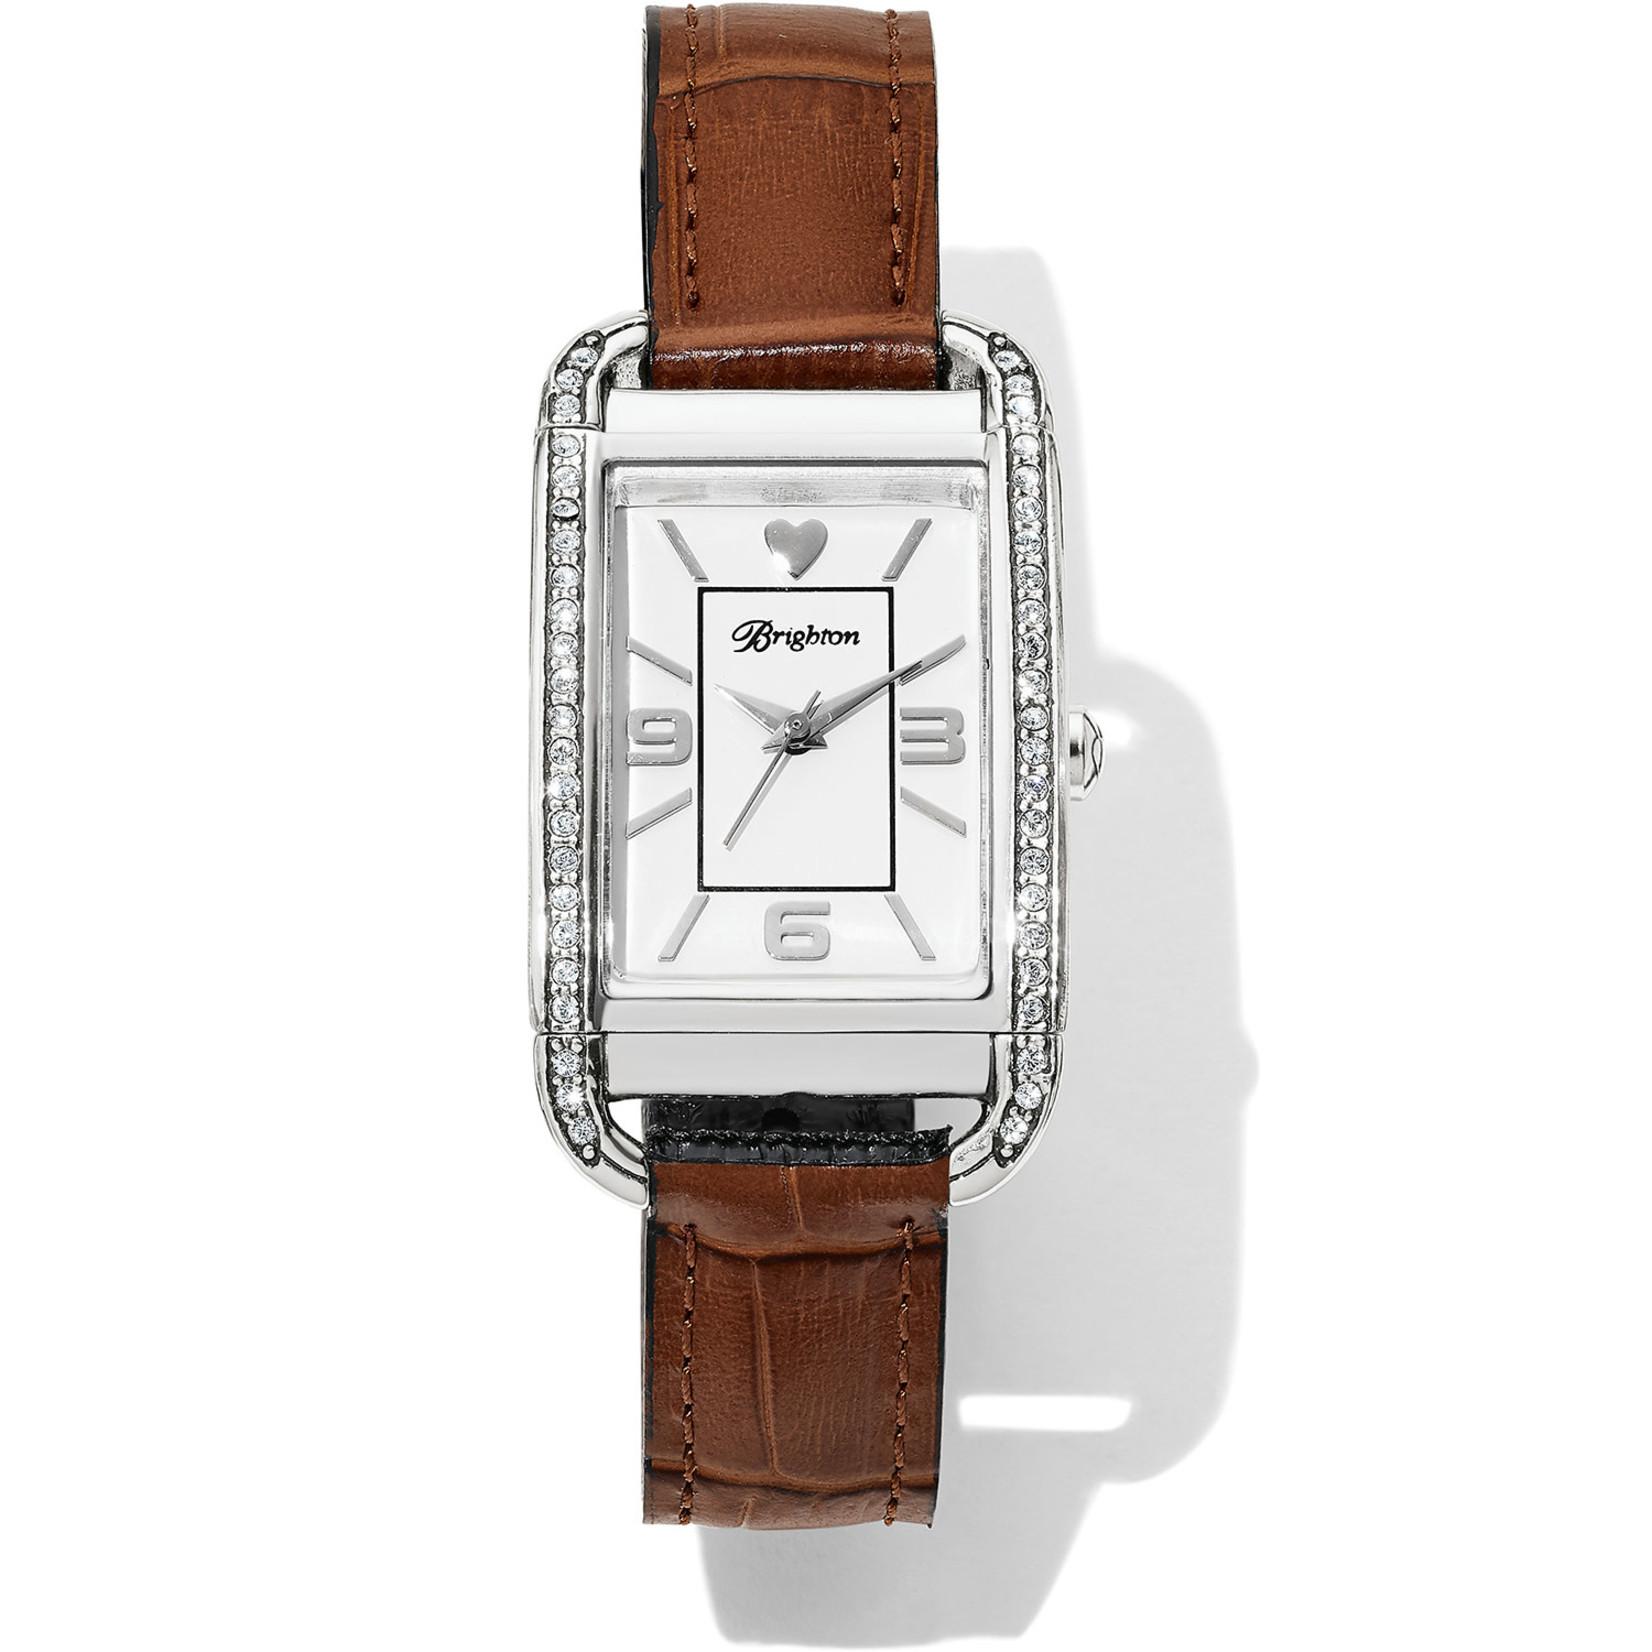 Brighton Watch/Monaco Reversible